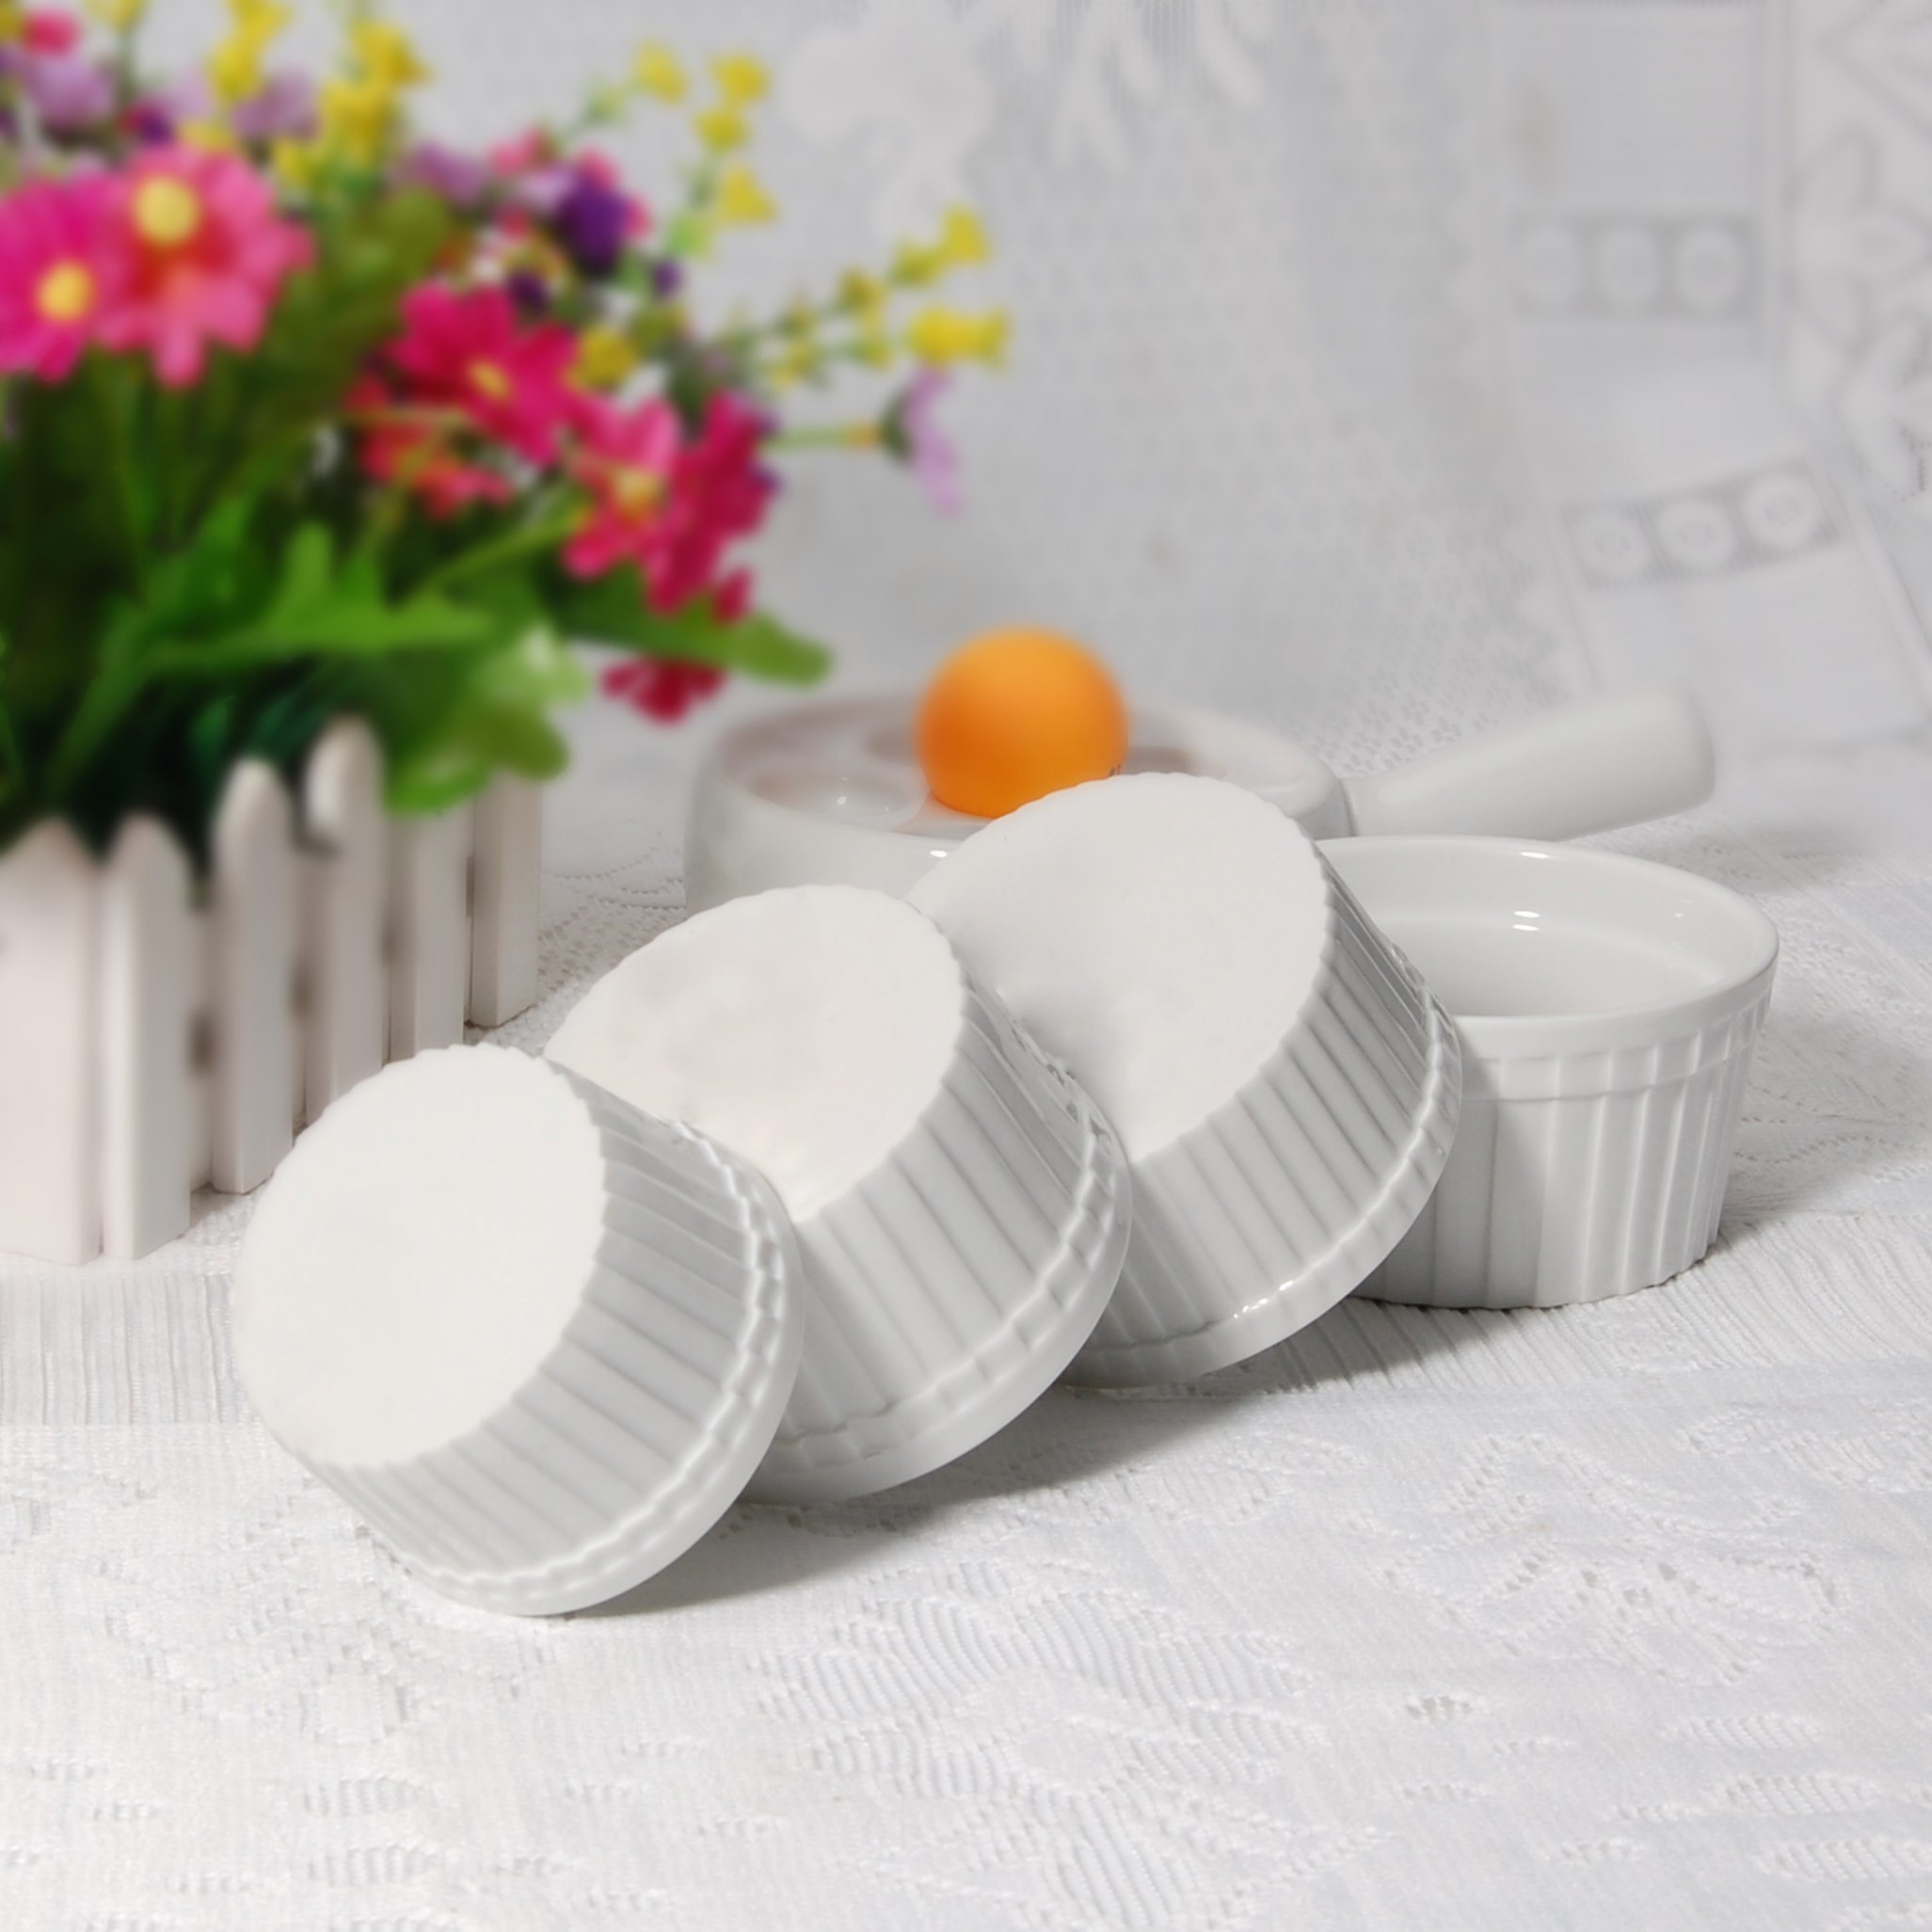 China Wholesale Kitchenware, Porcelain Hotel Round Bowl of All Sizes